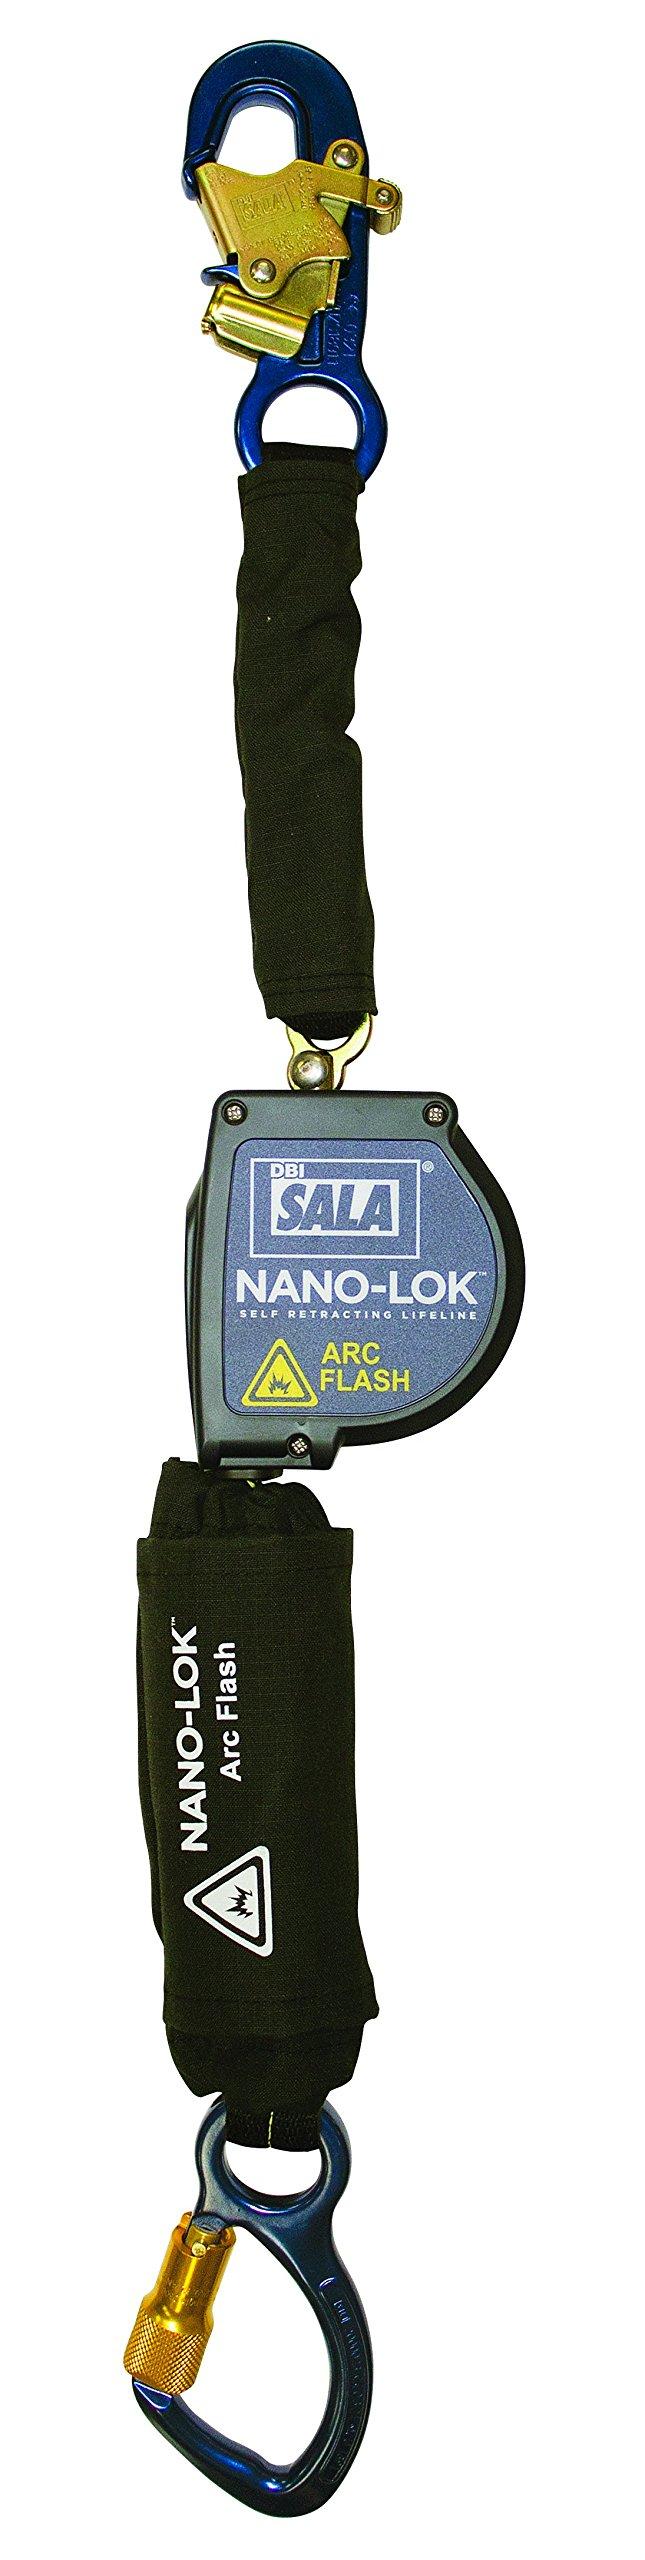 3M DBI-SALA Nano-Lok 3101575 Arc Flash 8' Single Bucket Truck Unit with Web Leg and Aluminum Captive Eye Carabiner, Blue/Black